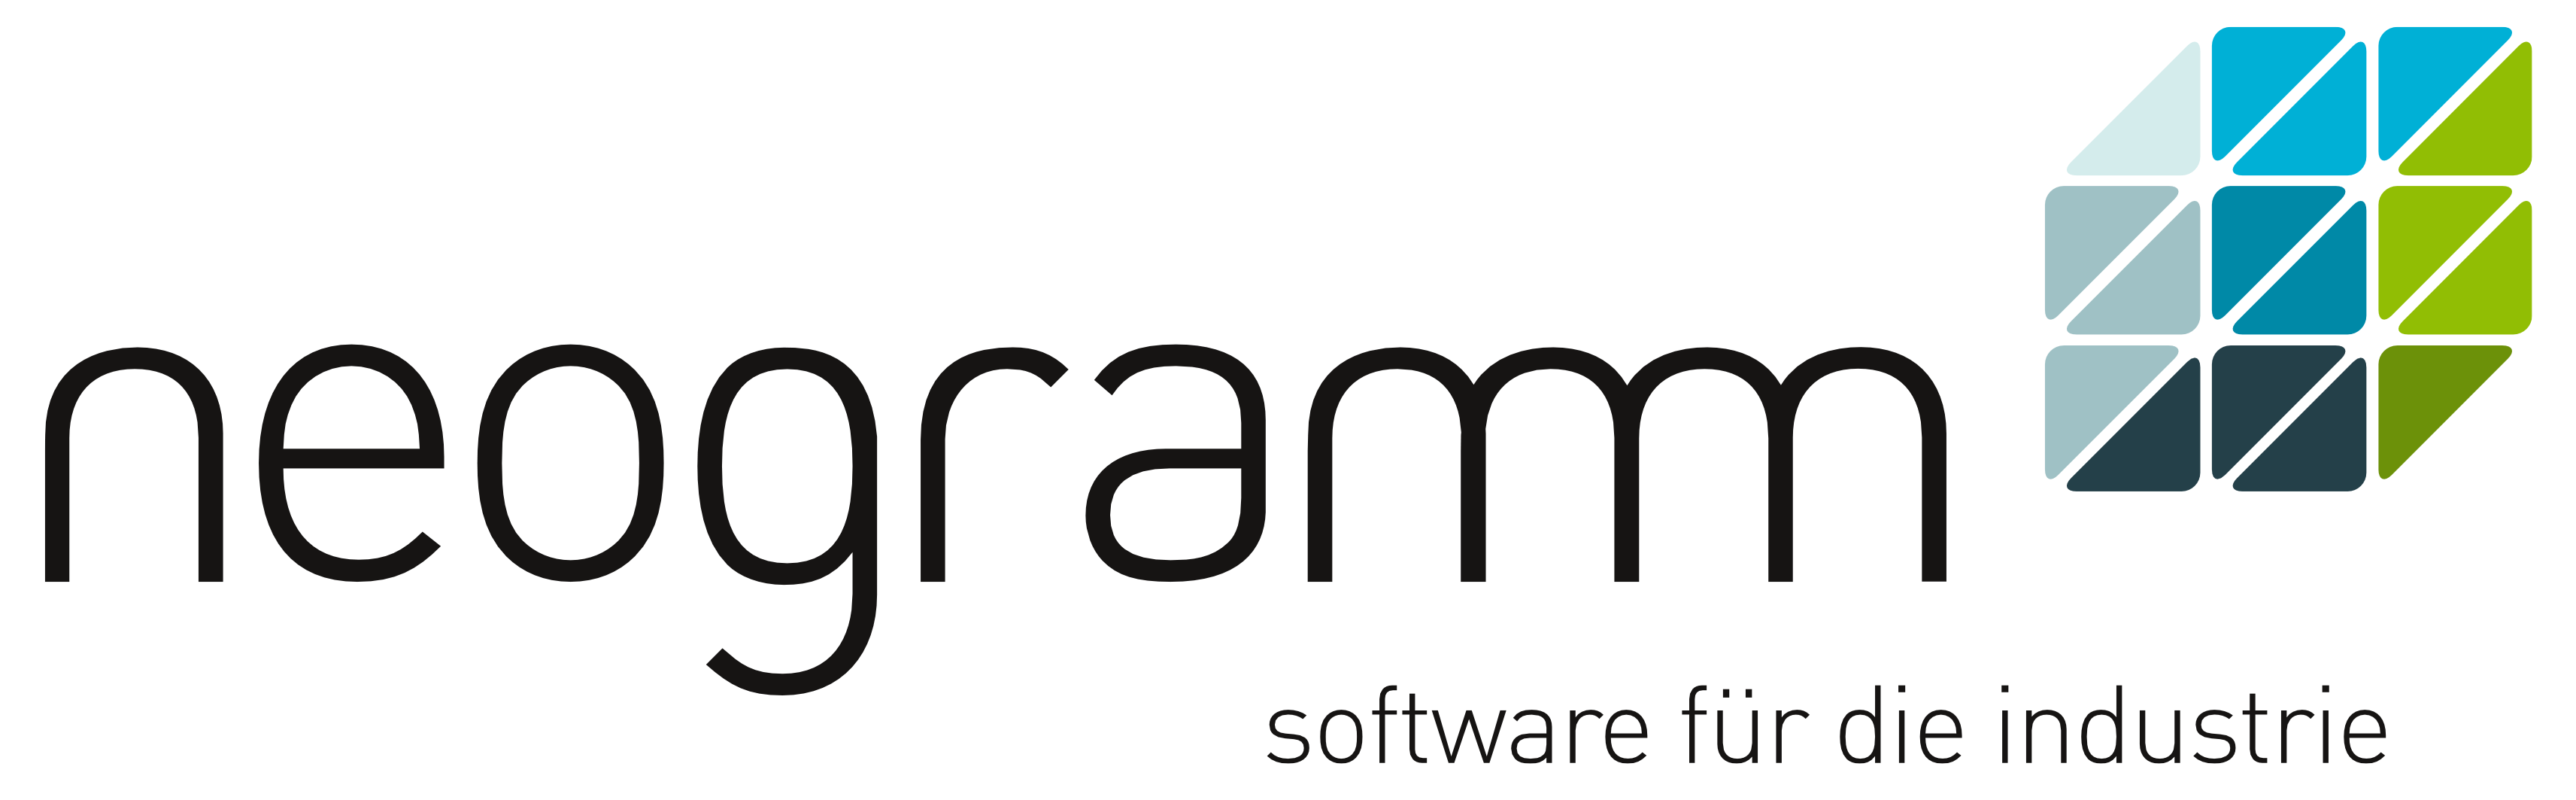 Neogramm Logo de